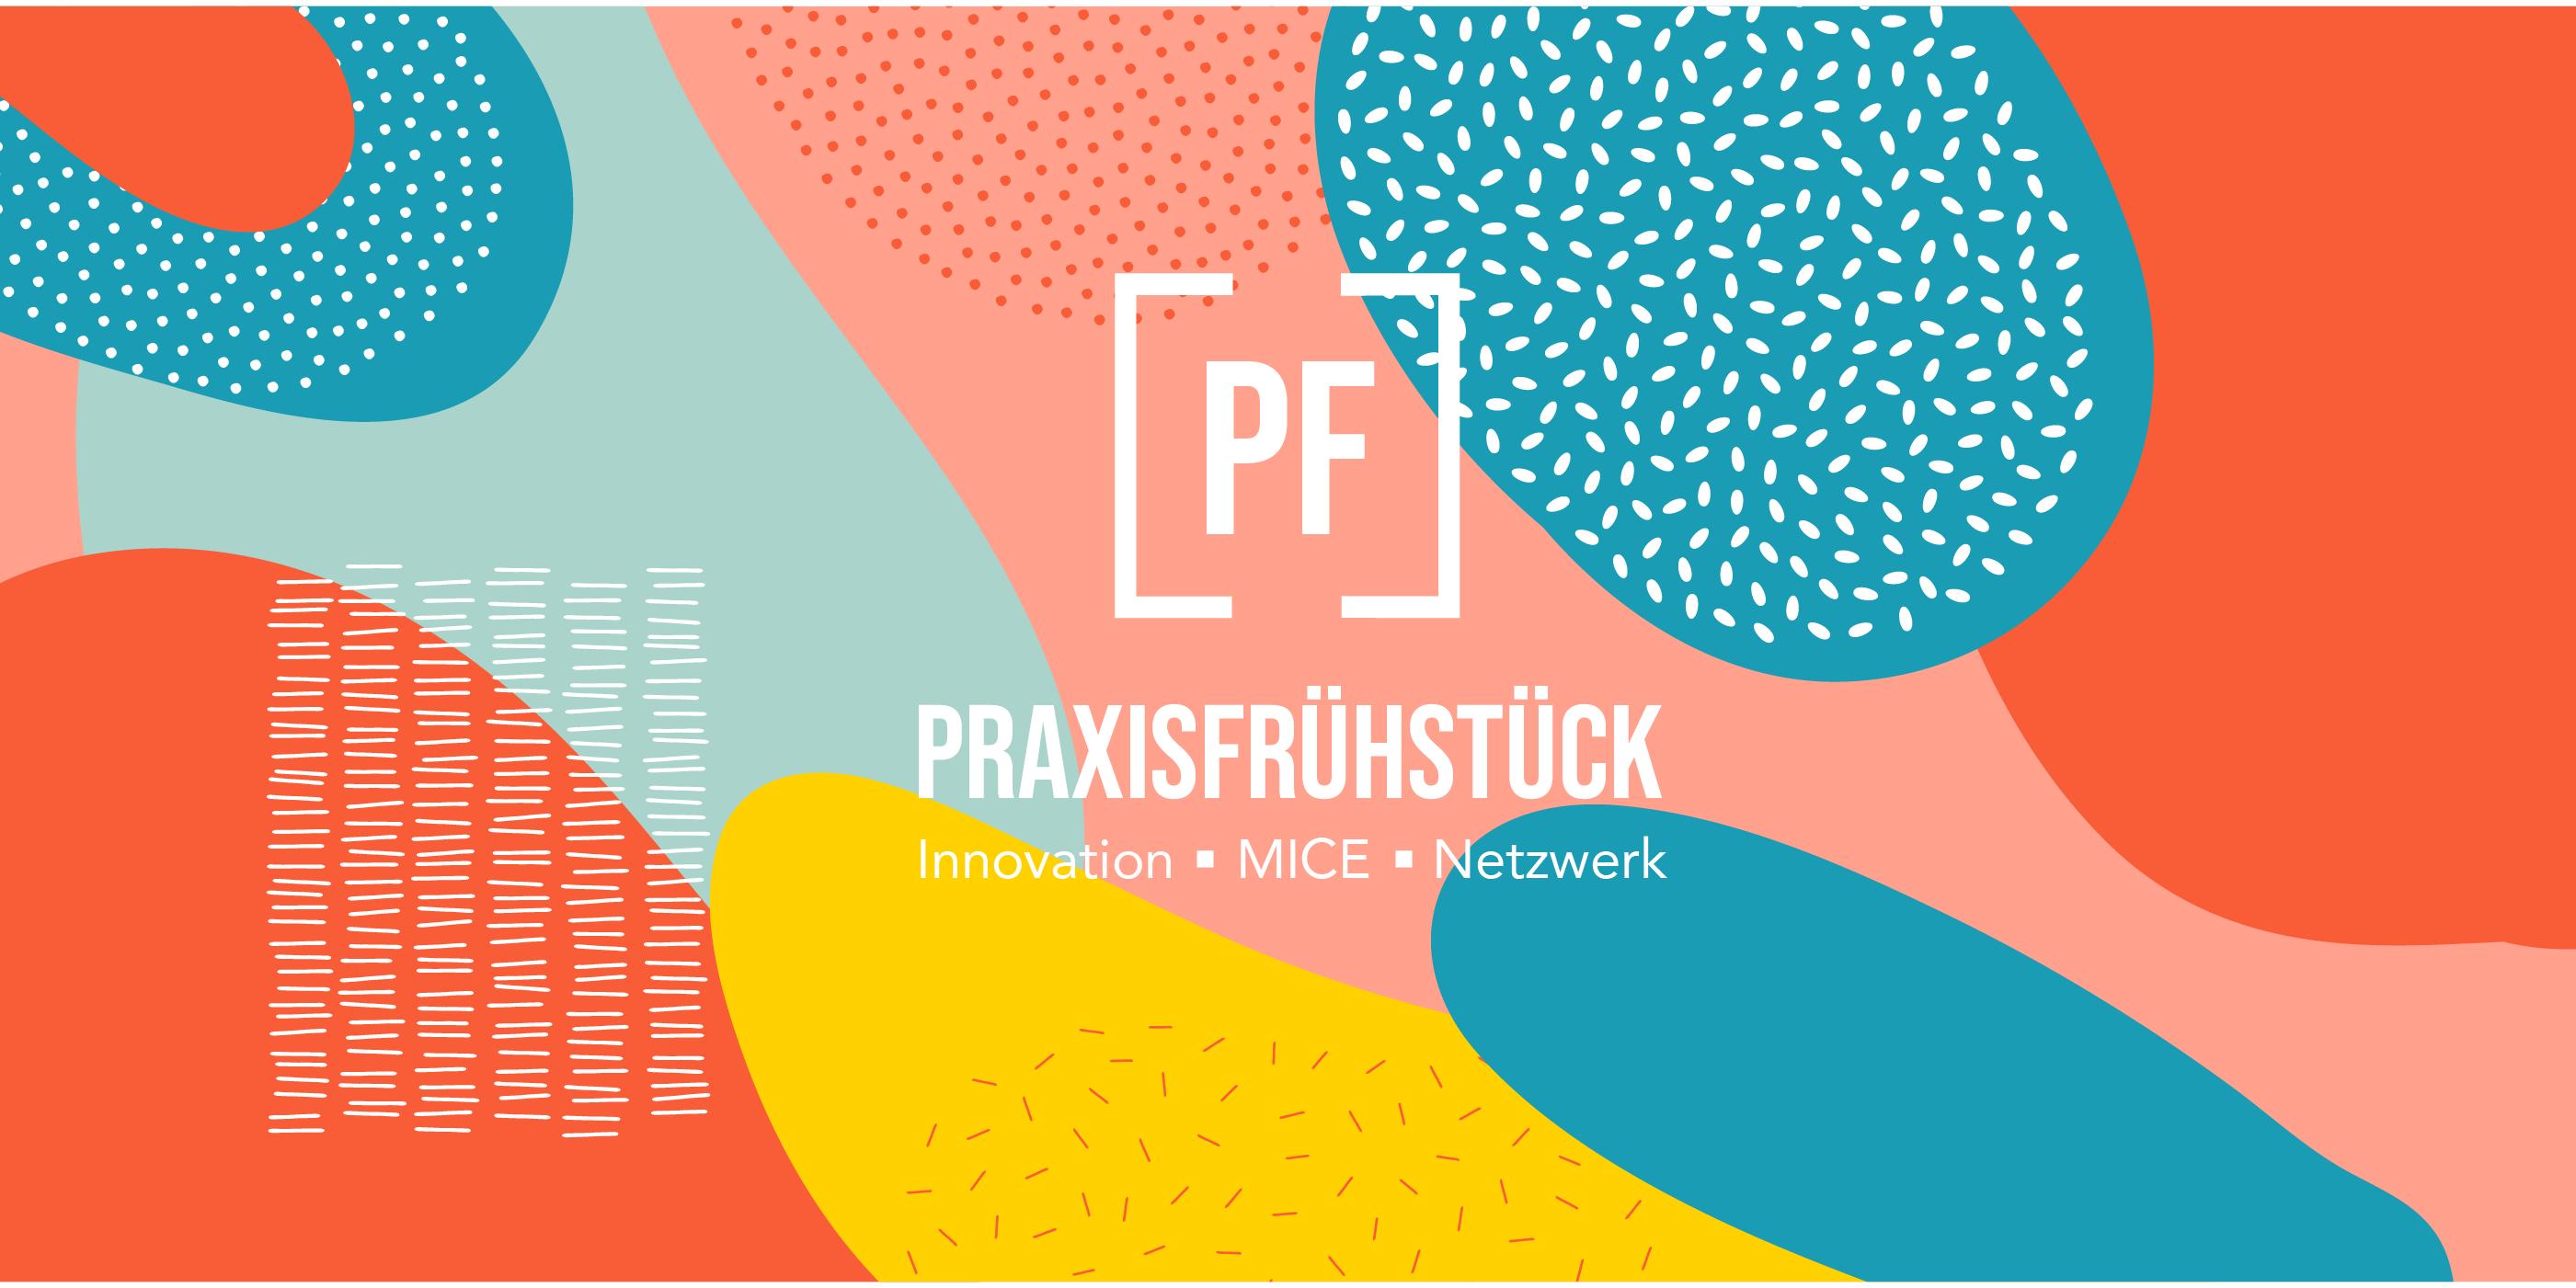 Praxisfrühstück – Innovation | MICE | Netzwerken